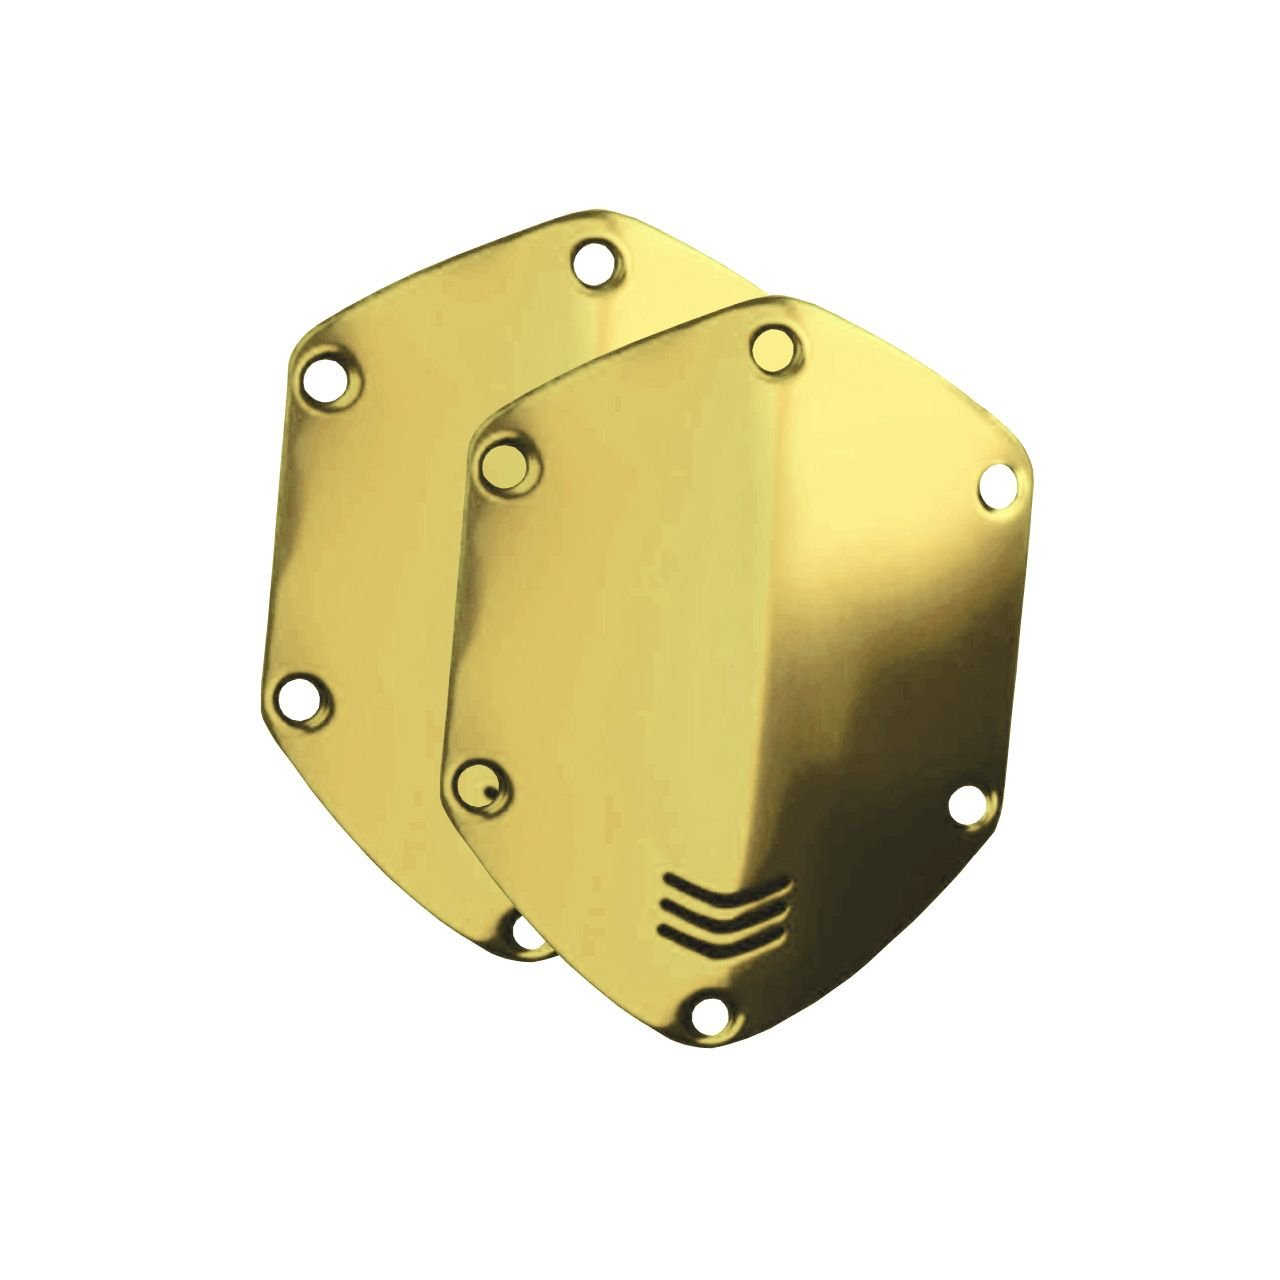 V-MODA Crossfade On-Ear Headphone Metal Shield Kit цена и фото